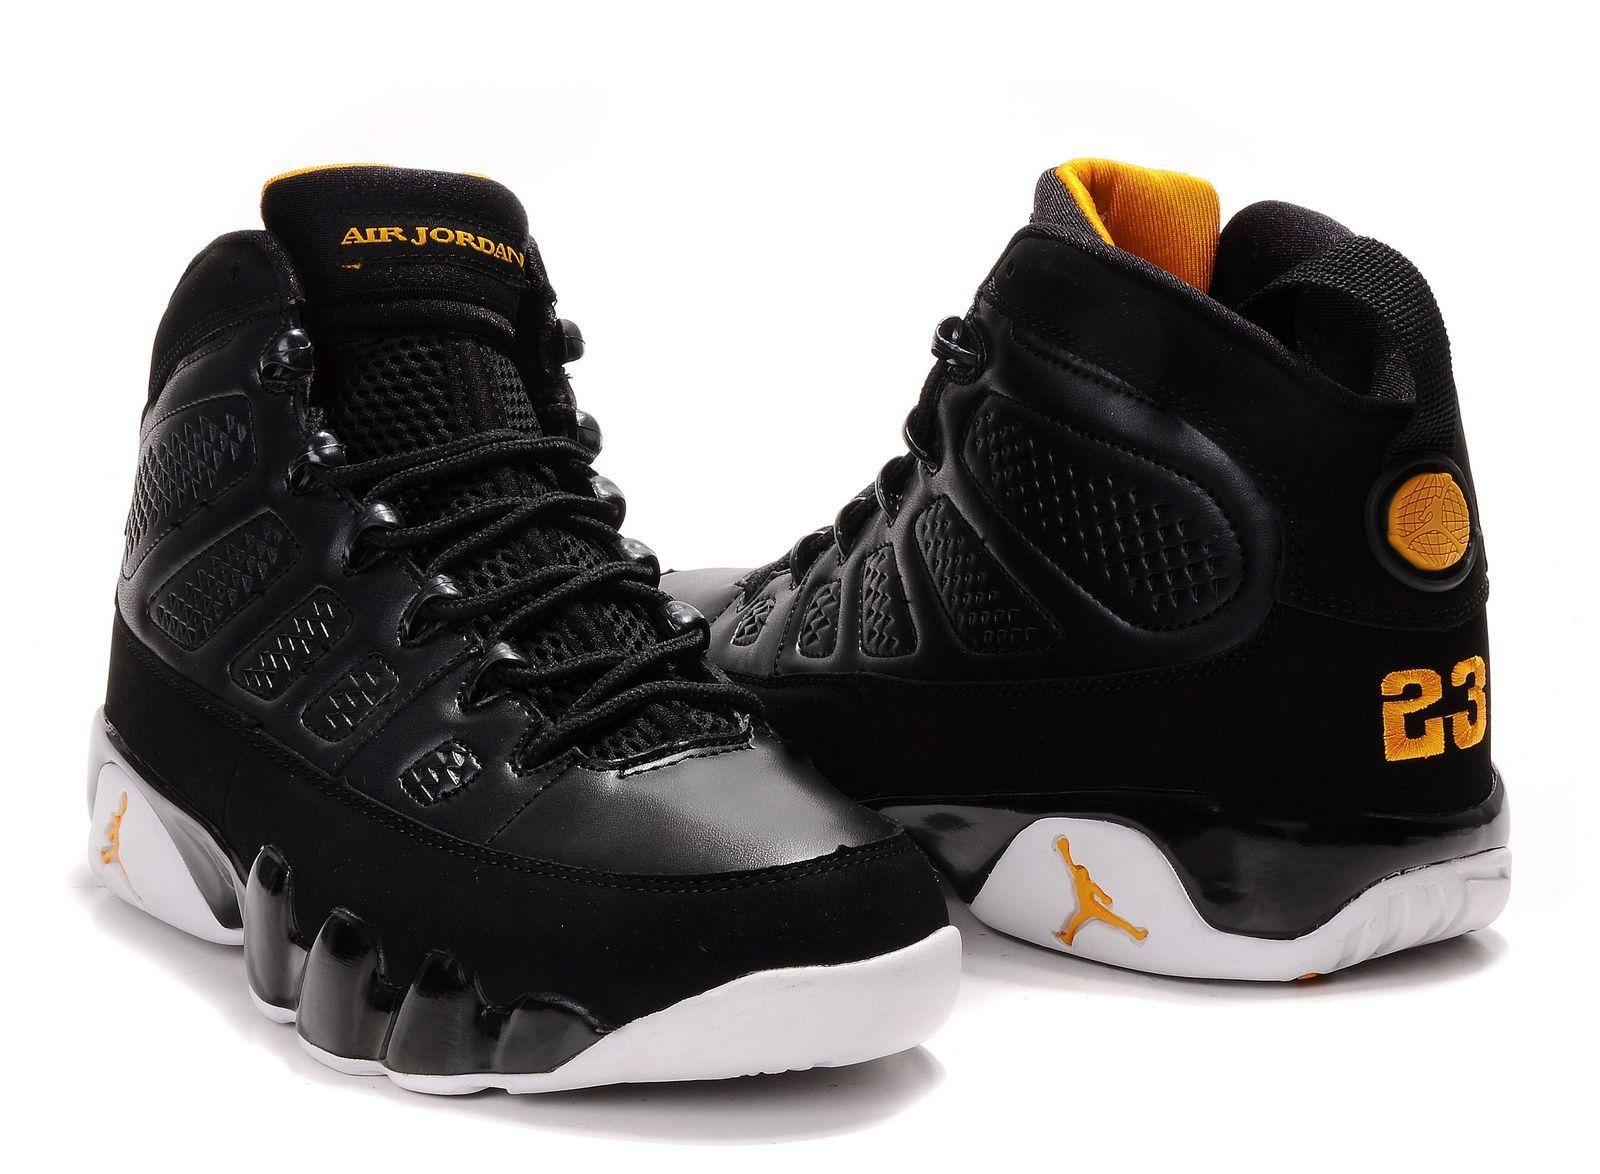 Air Jordan 23 Anniversary Shoes (With images) | Air jordans